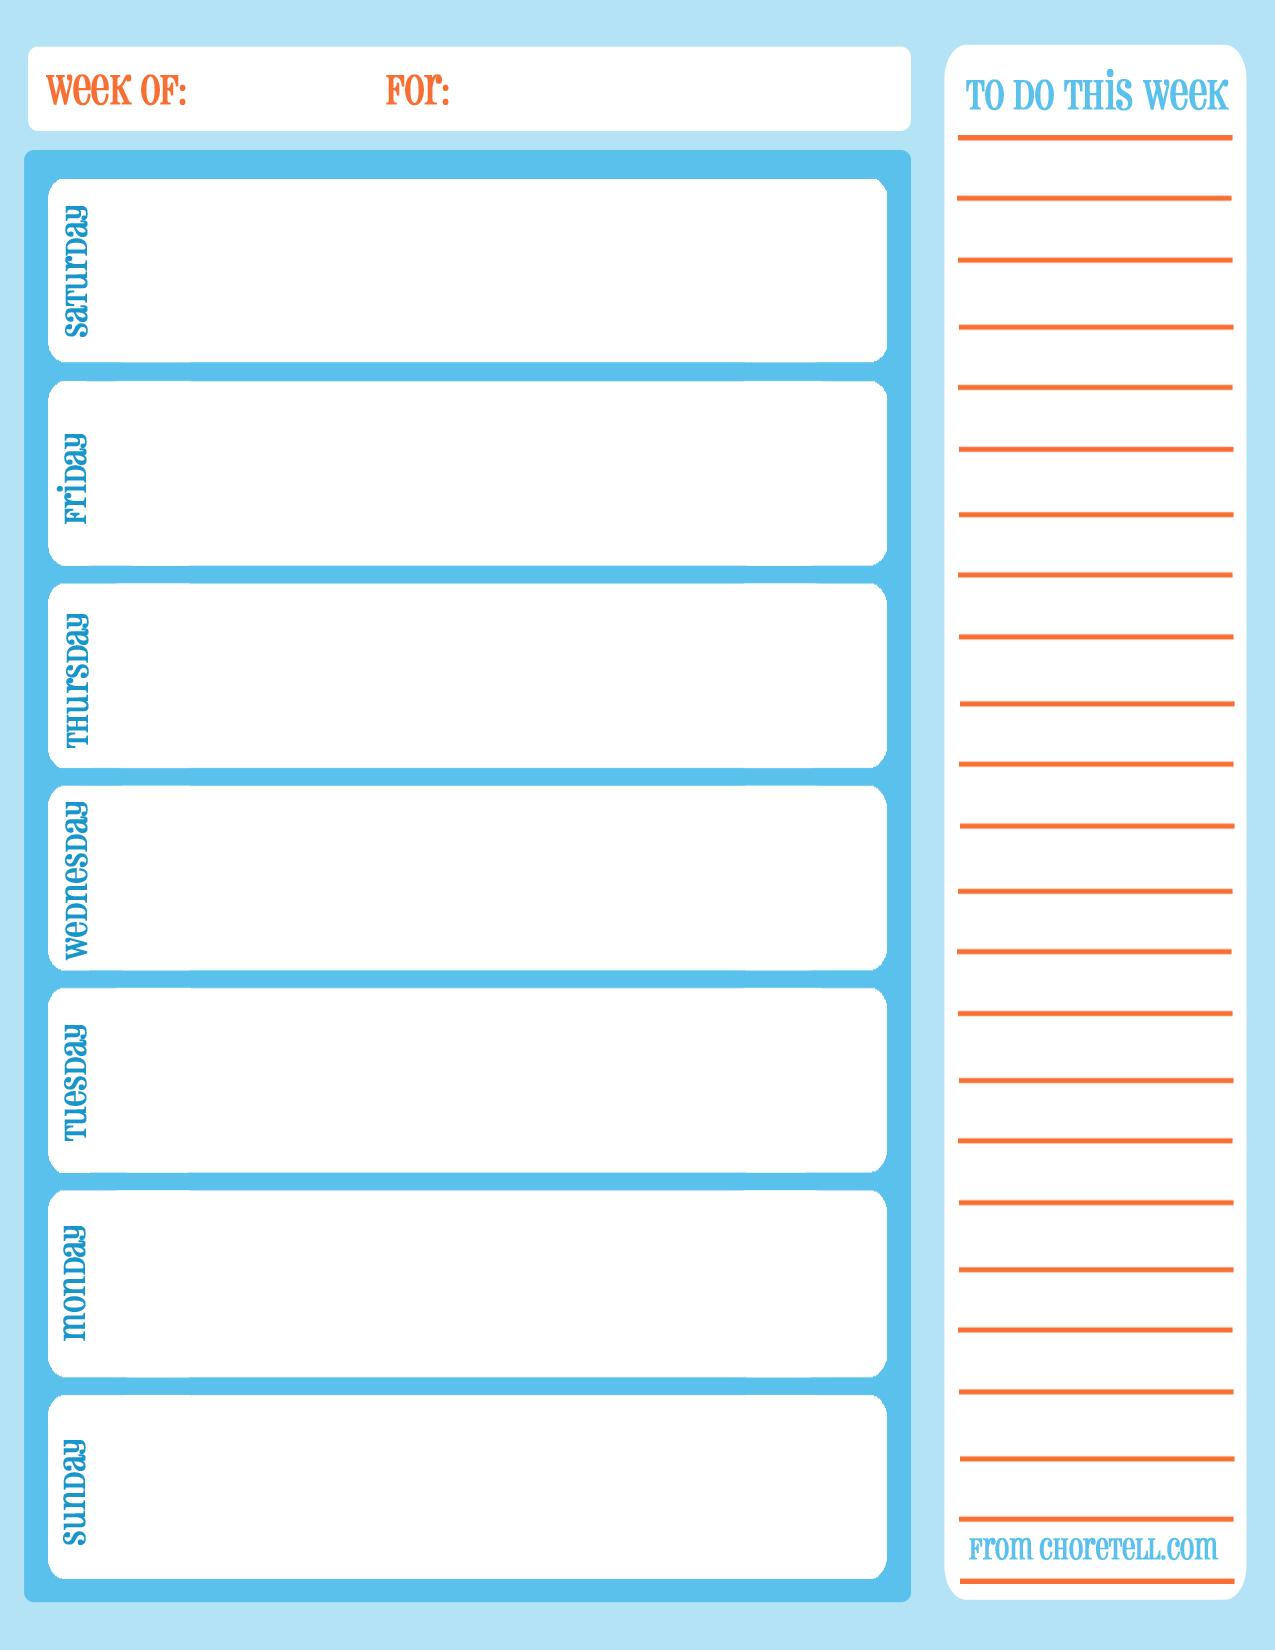 Free Printable Planner Weekly Minute Intervals Monthly Pdf Schedule - Free Printable Schedule